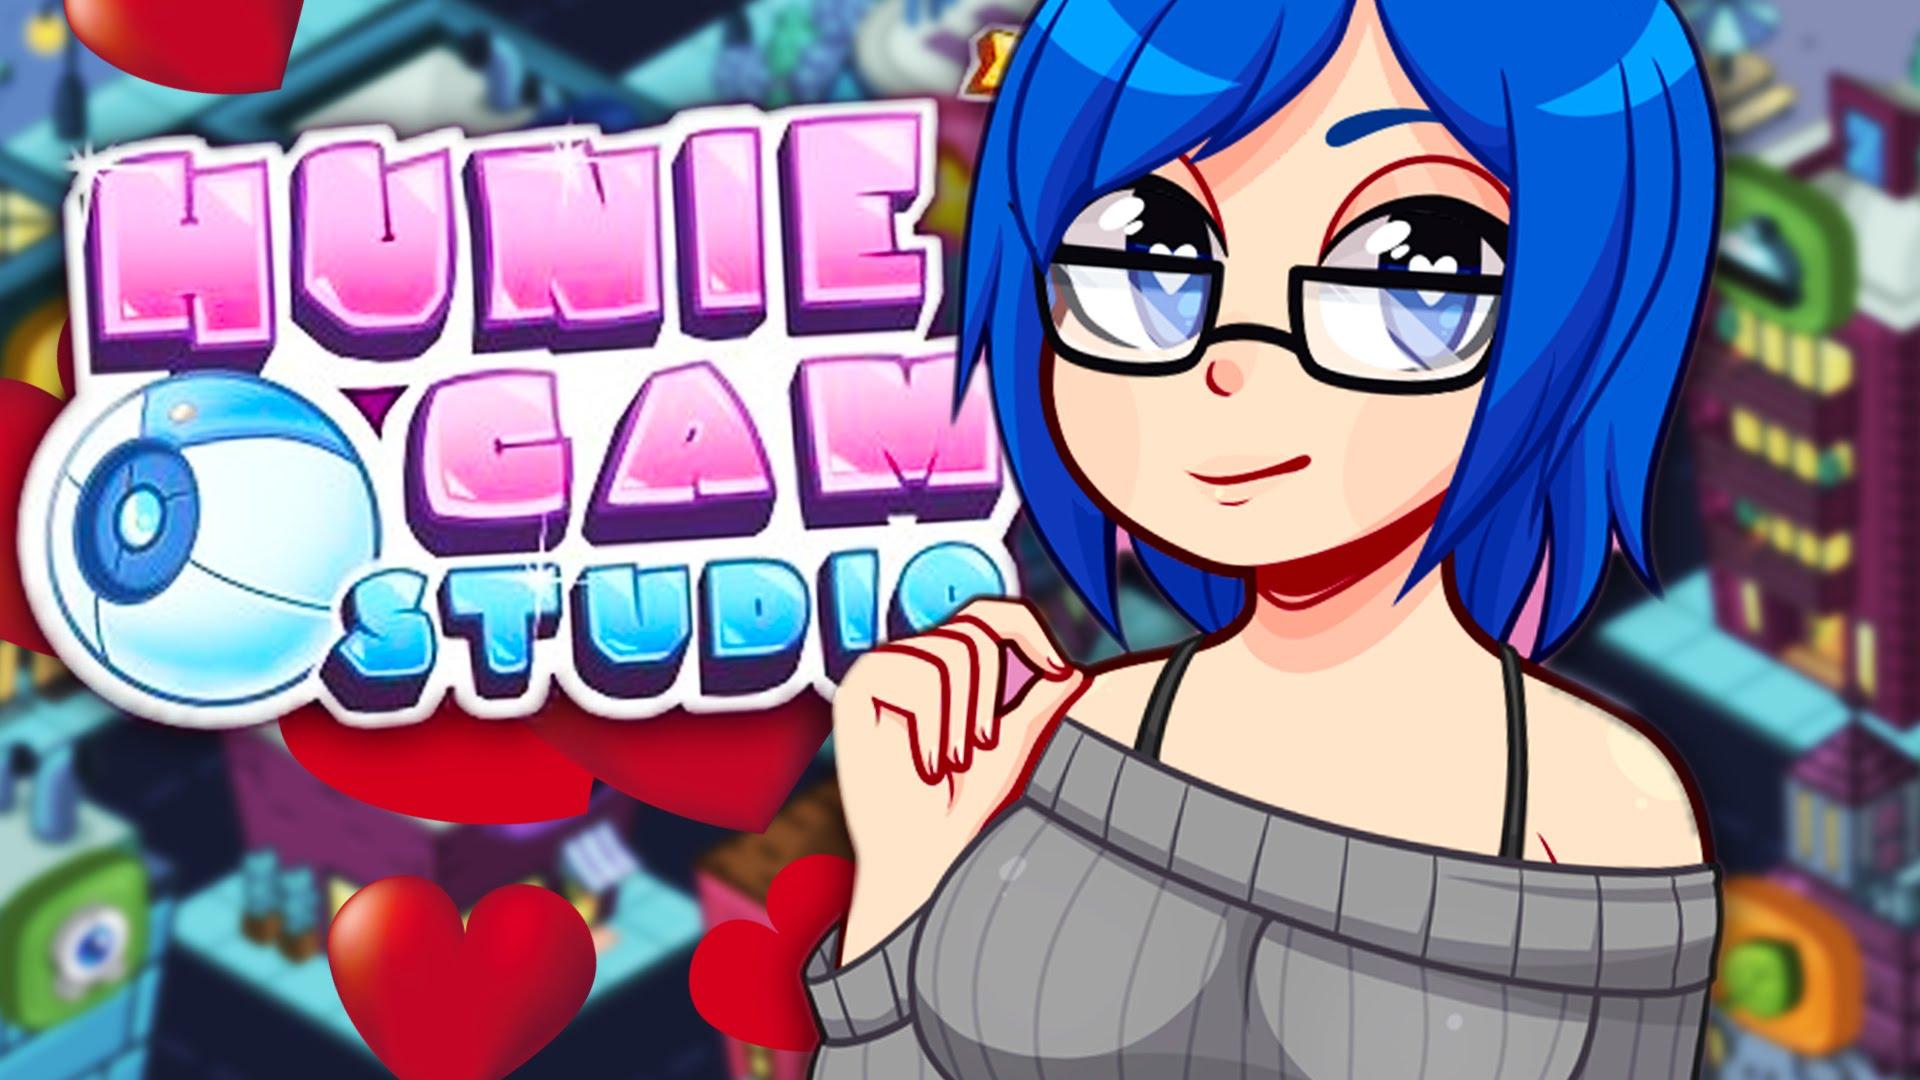 huniecam studio game free